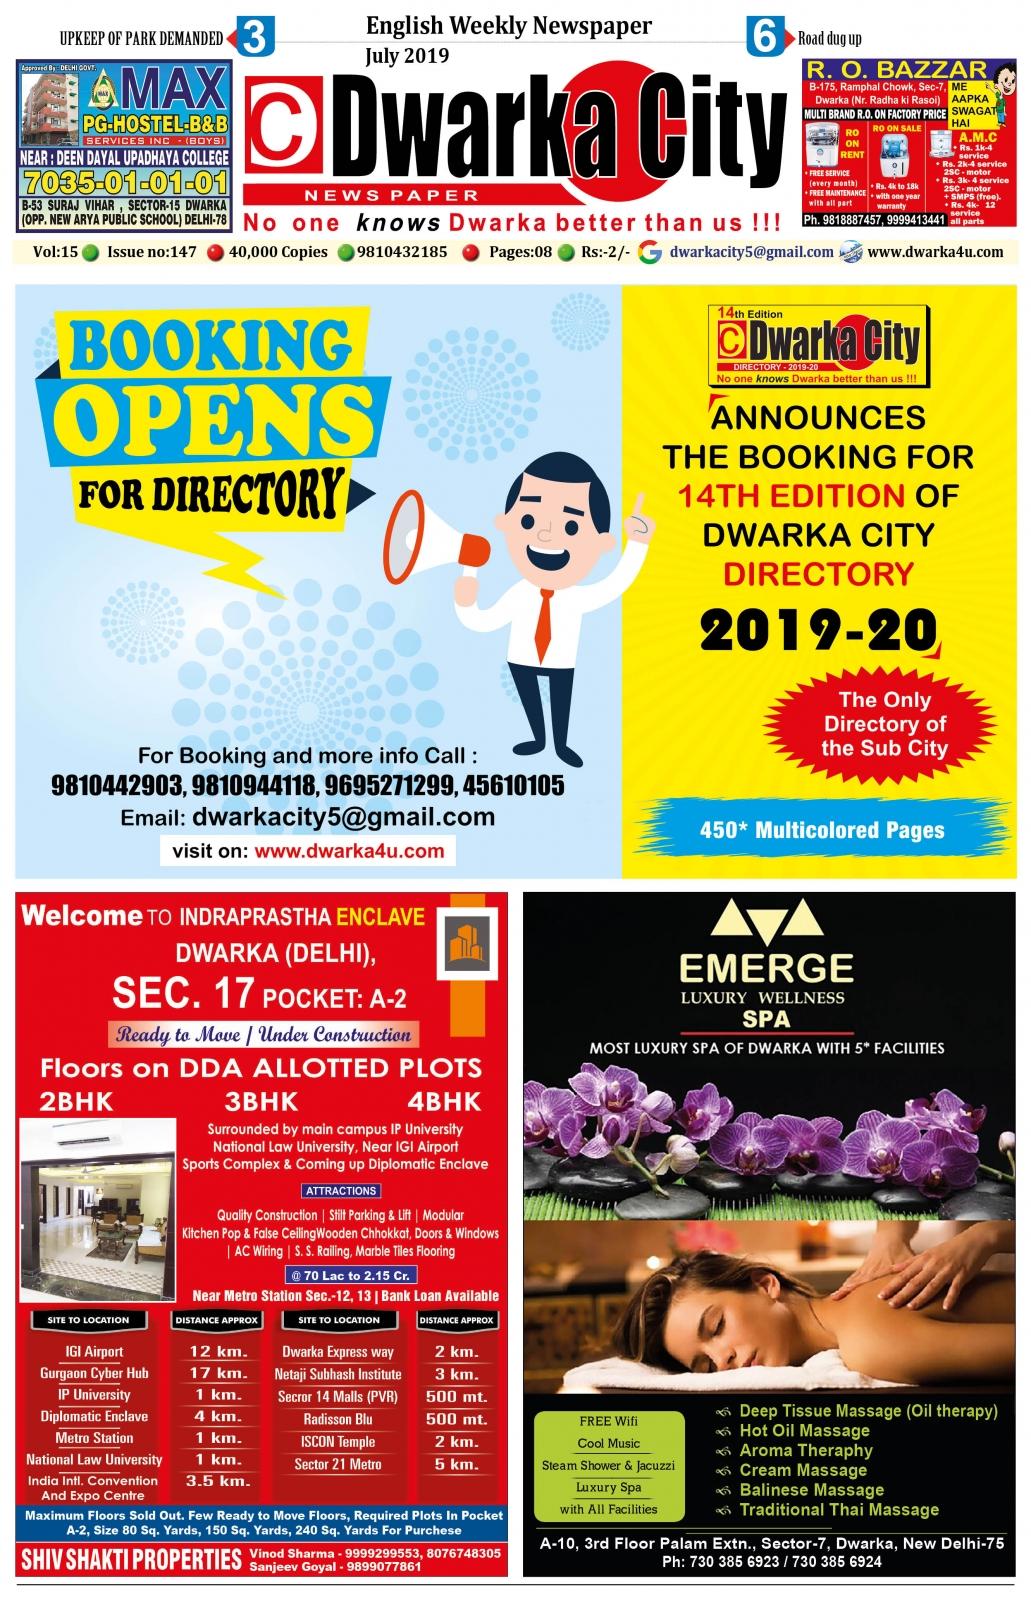 DWARKA CITY JULY 1st Issue 2019